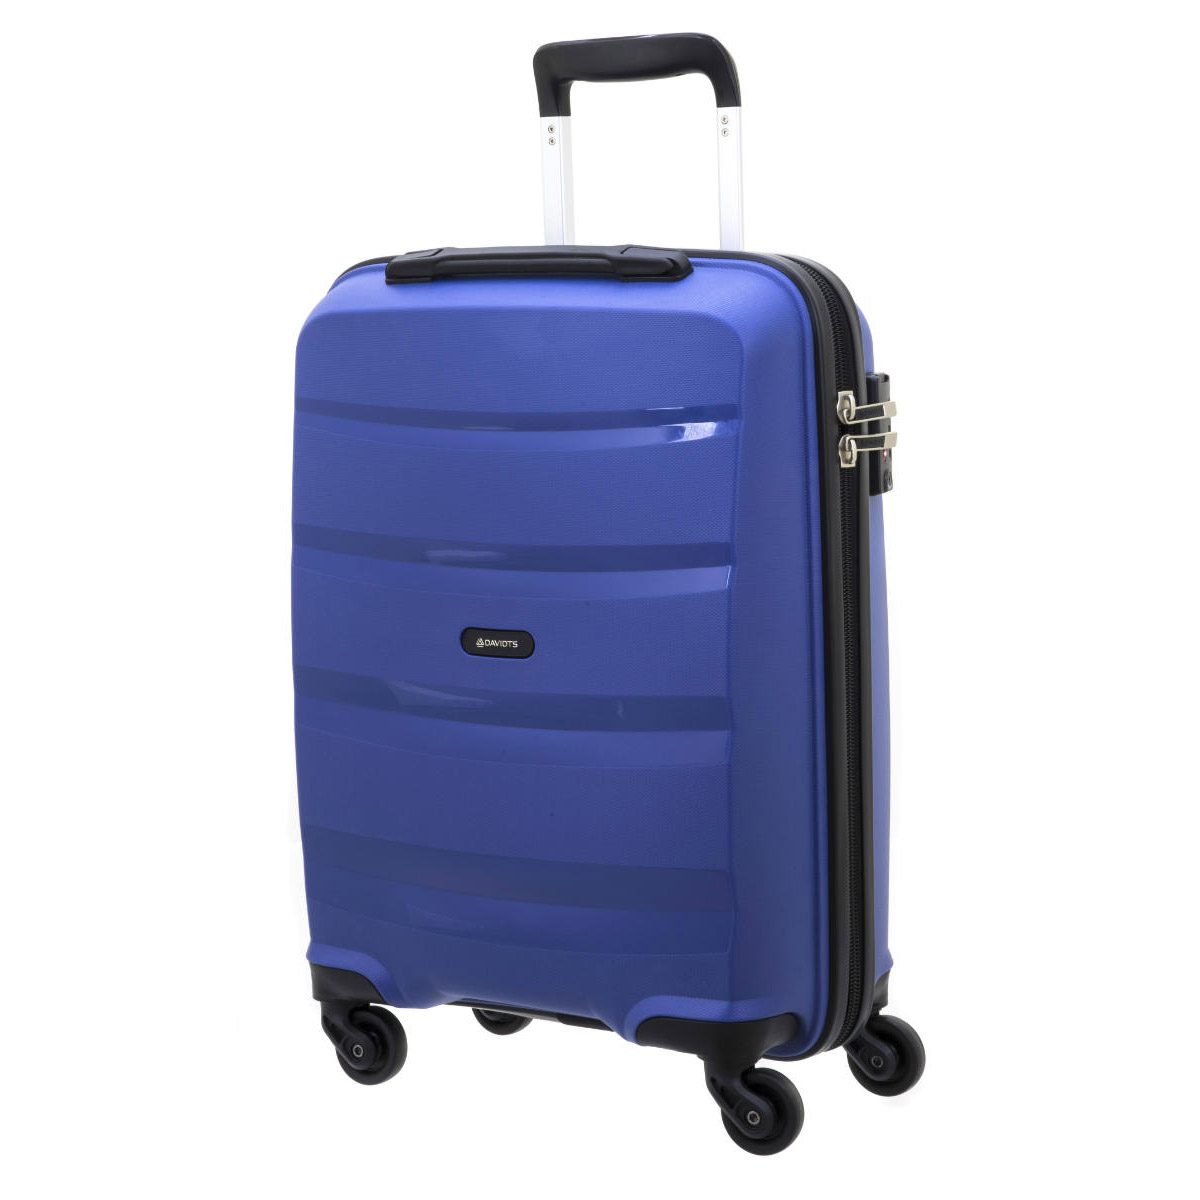 Valise trolley coque polypropylène \'Davidt\'s\' bleu (format cabine) - 55x38x20 cm - [Q3493]